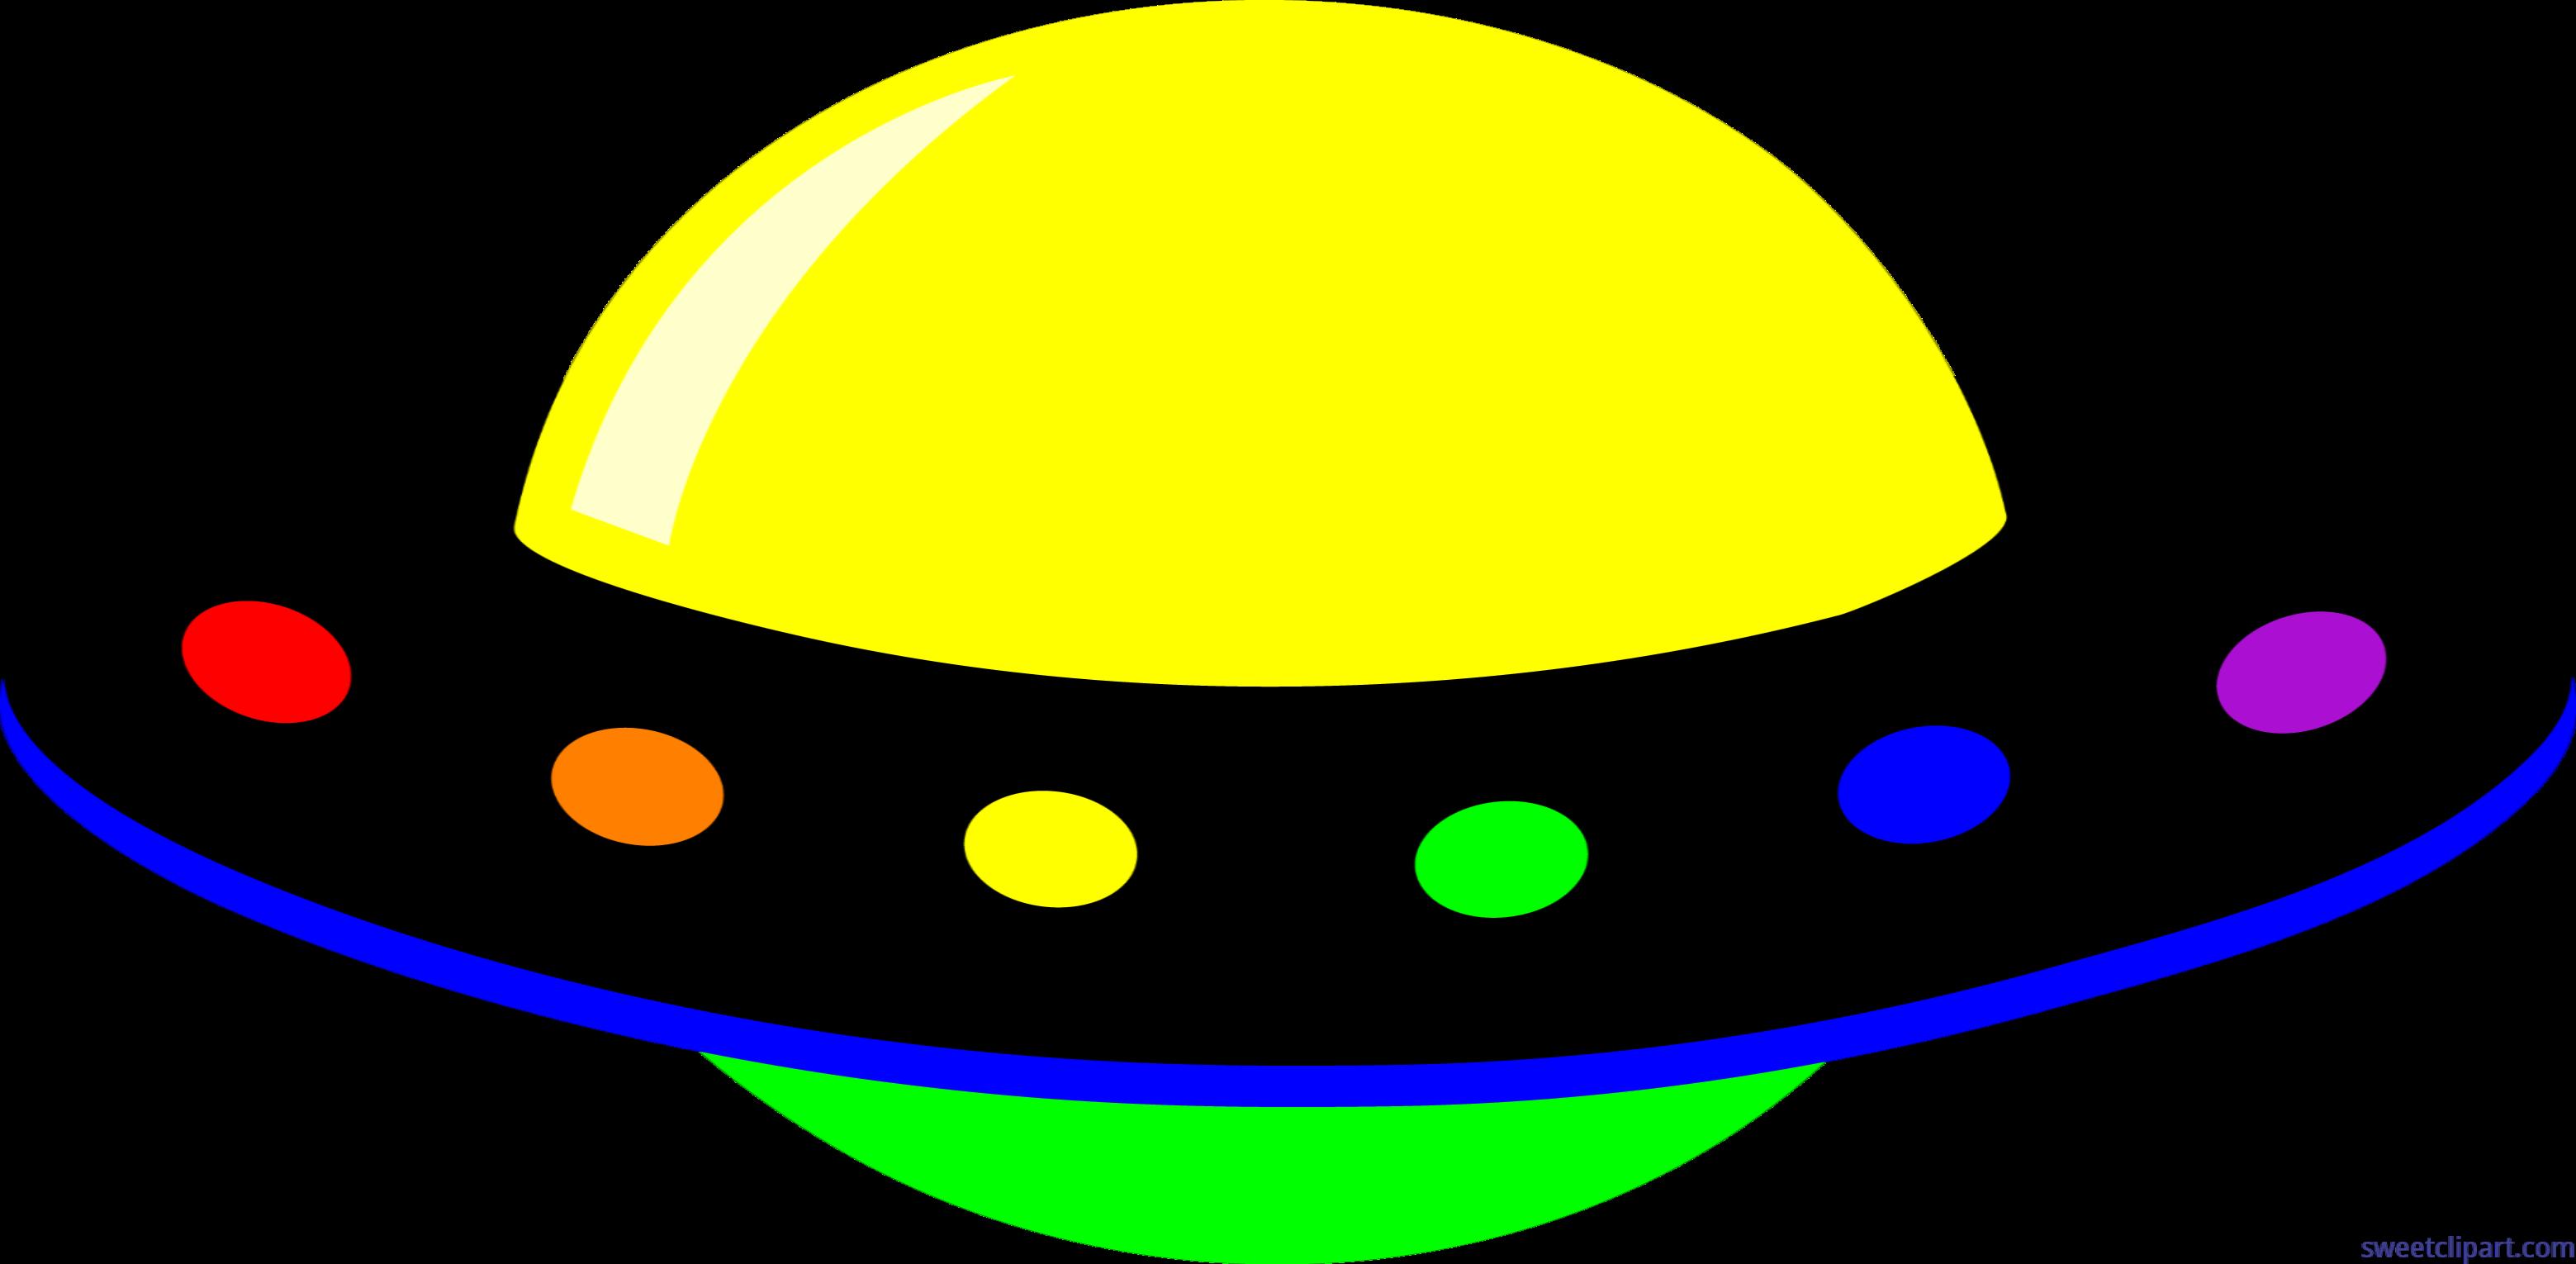 Ufo neon clip art. Clipart rainbow cute